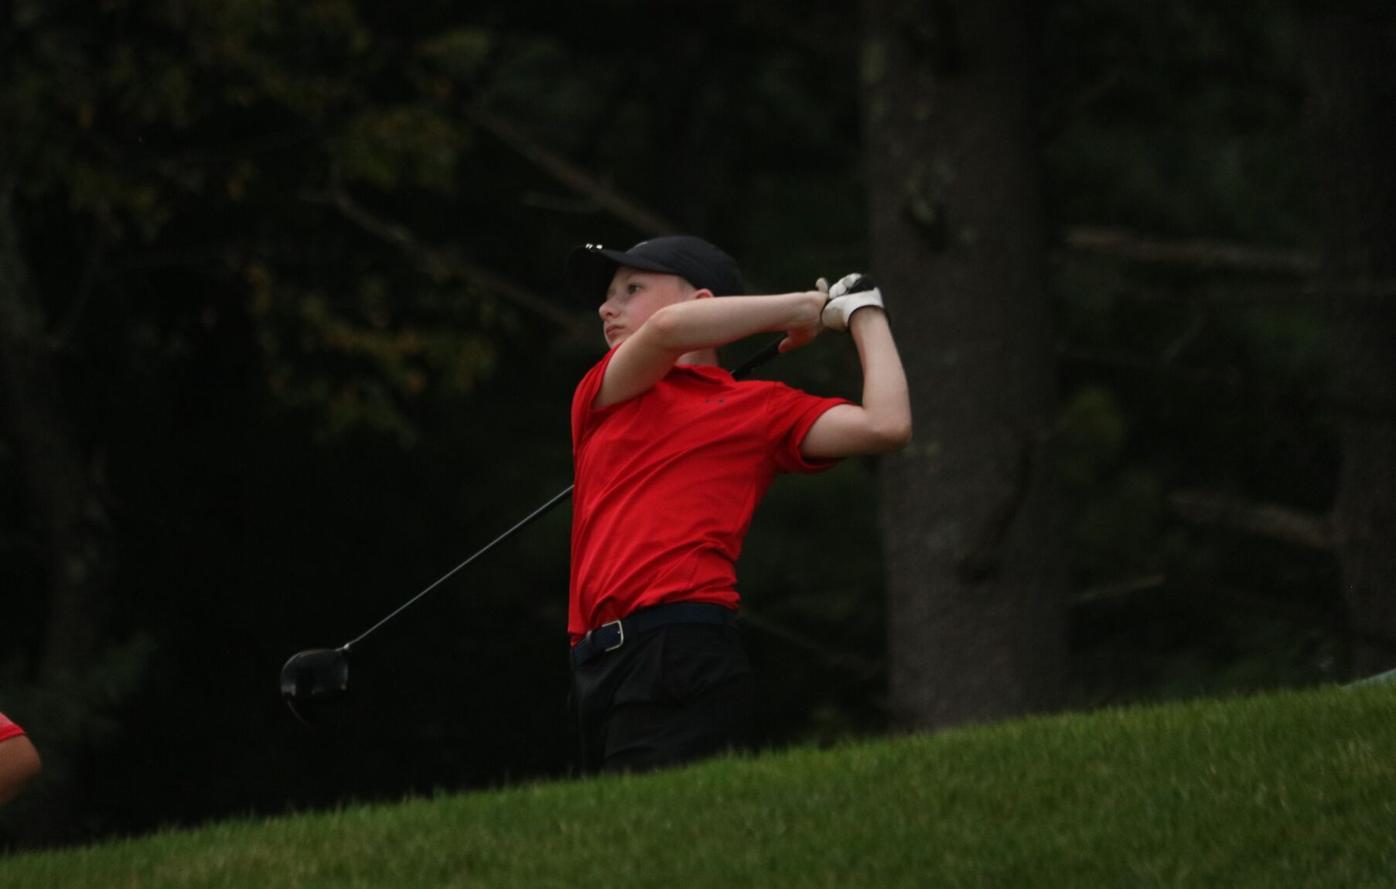 hoosac valley golfer drives